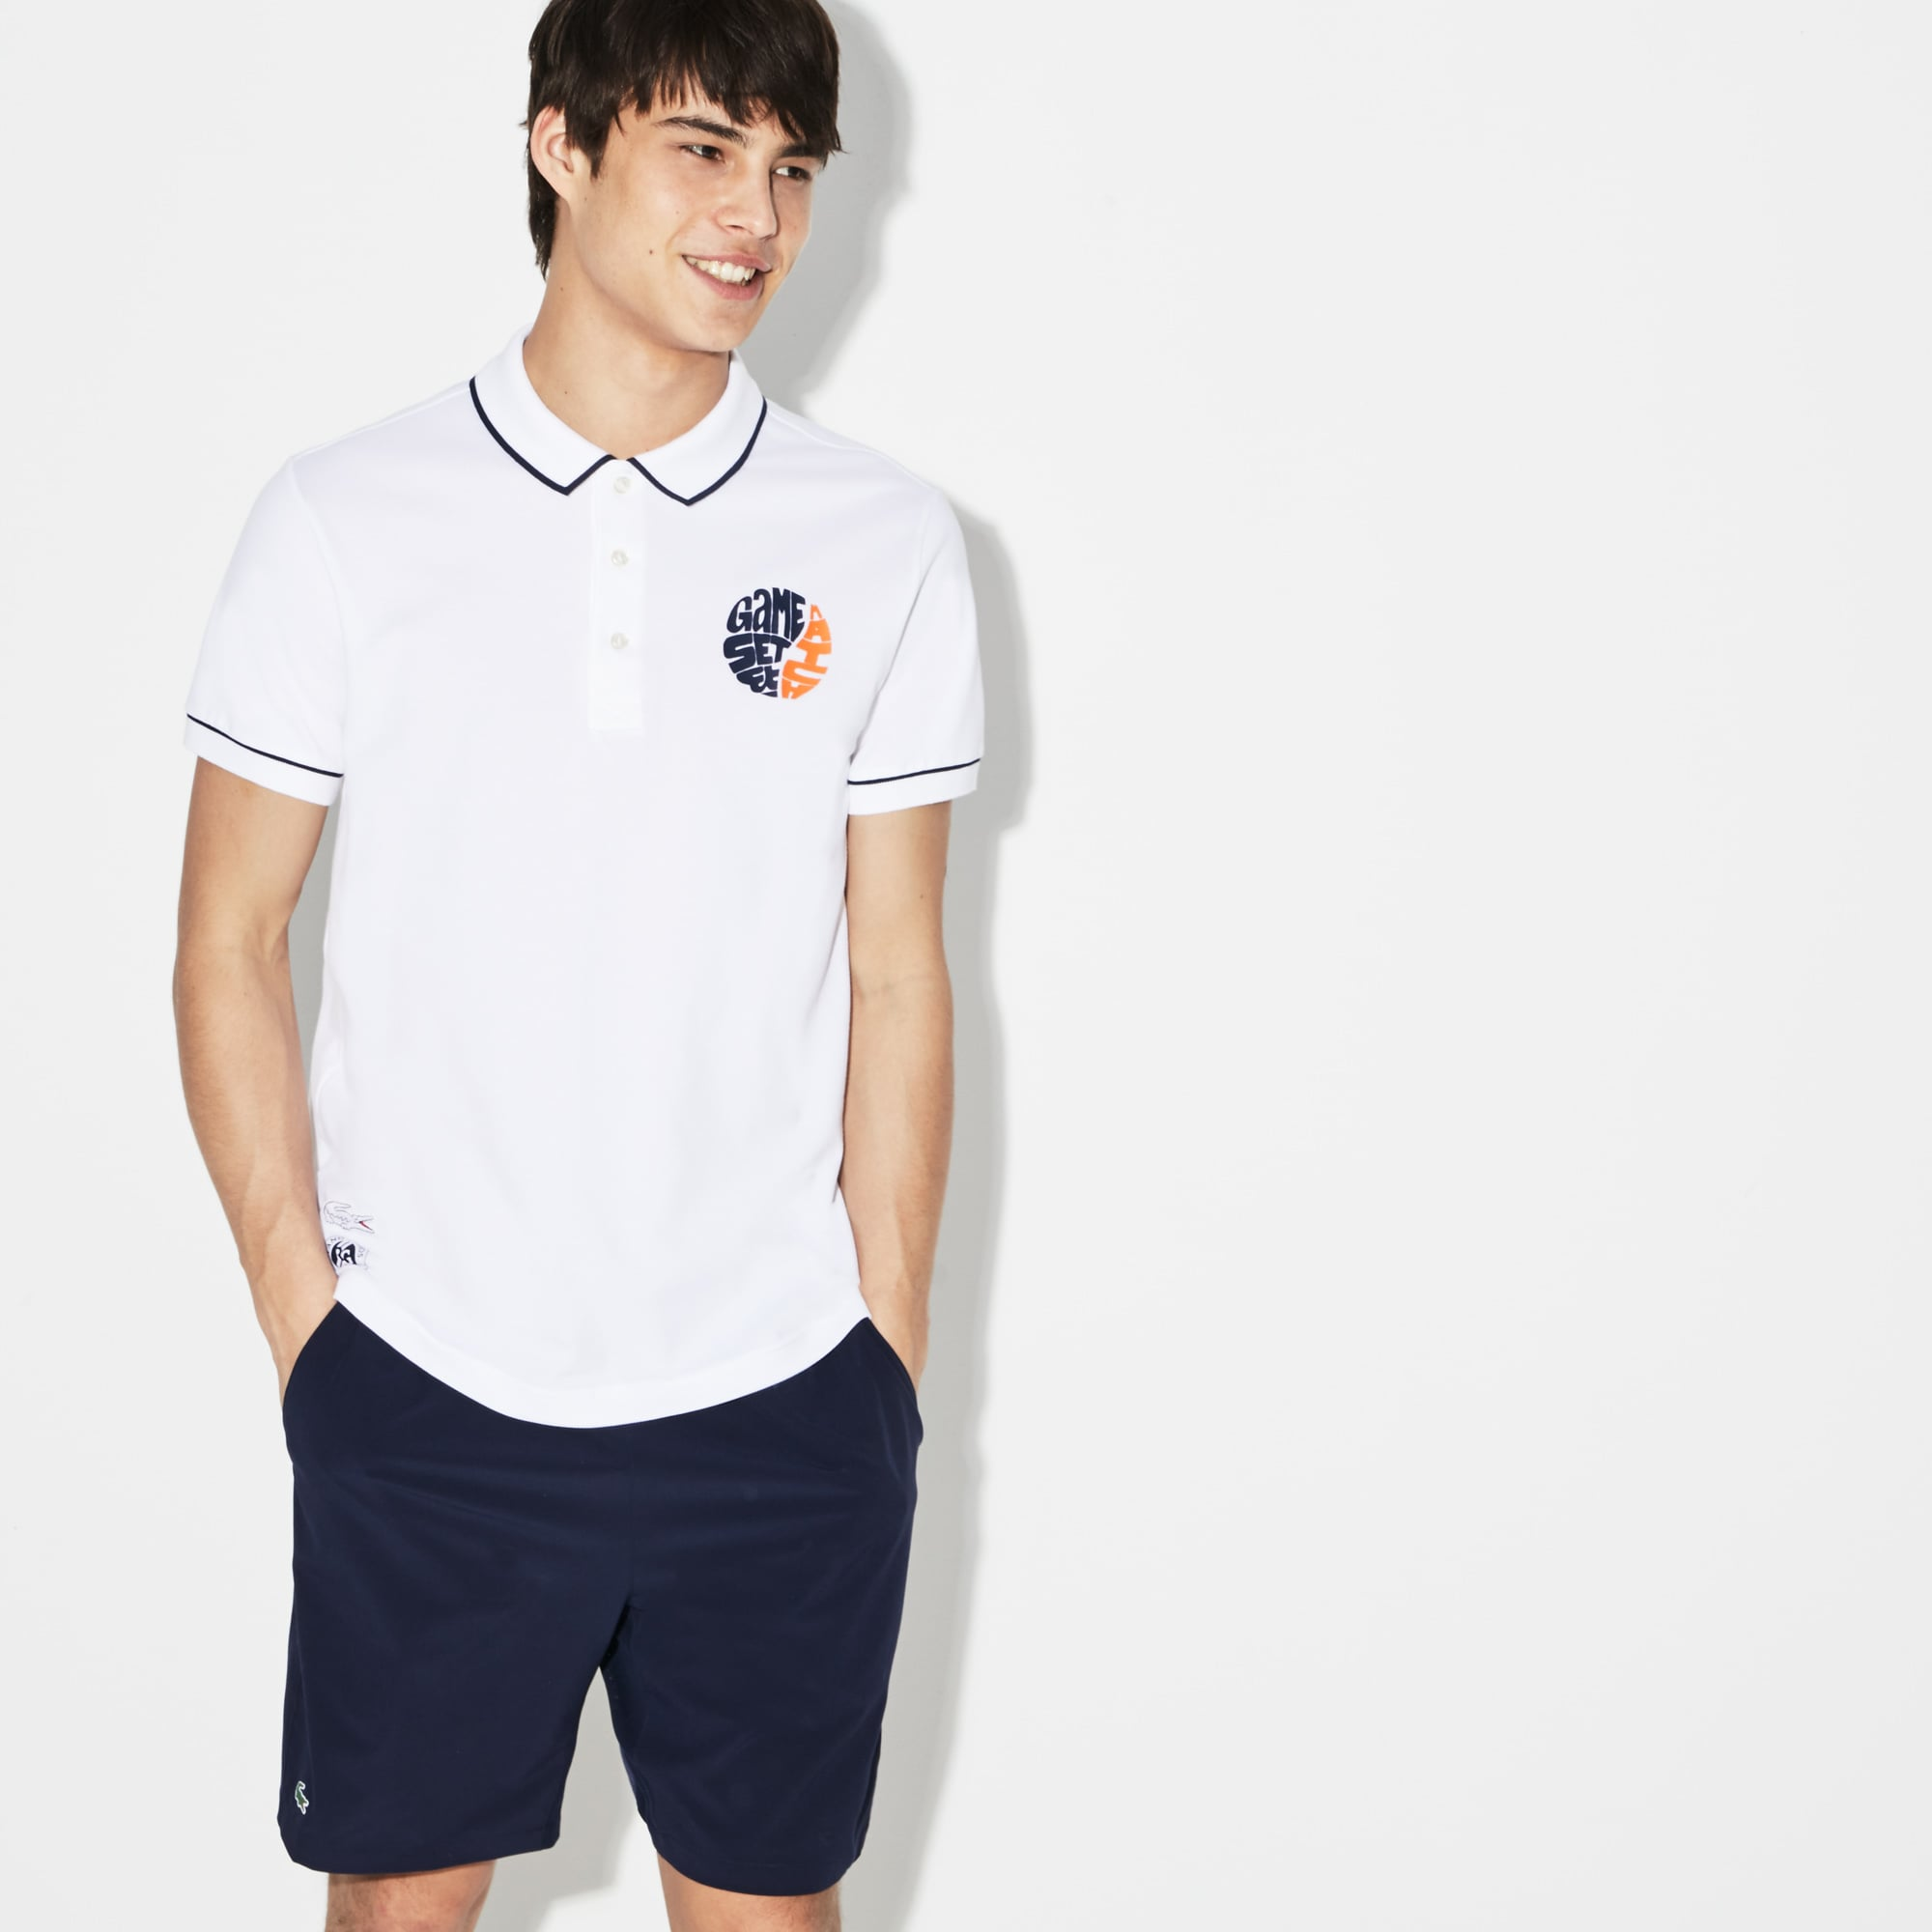 Camisas polo para homens, manga longa e manga curta   LACOSTE 77393cc1c4